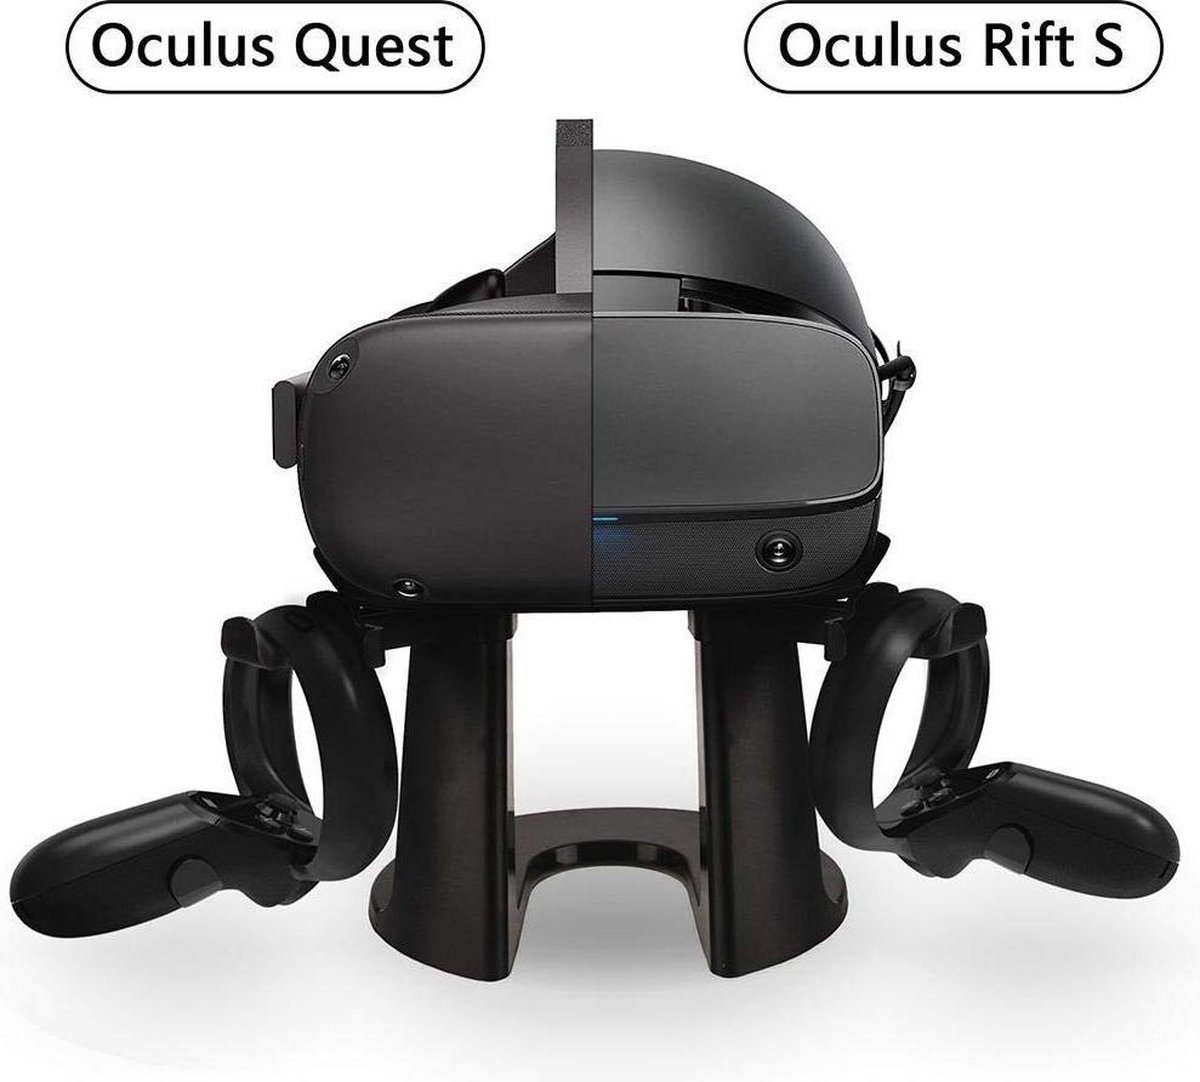 VR bril houder voor Oculus Quest(1 en 2) - Oculus Touch